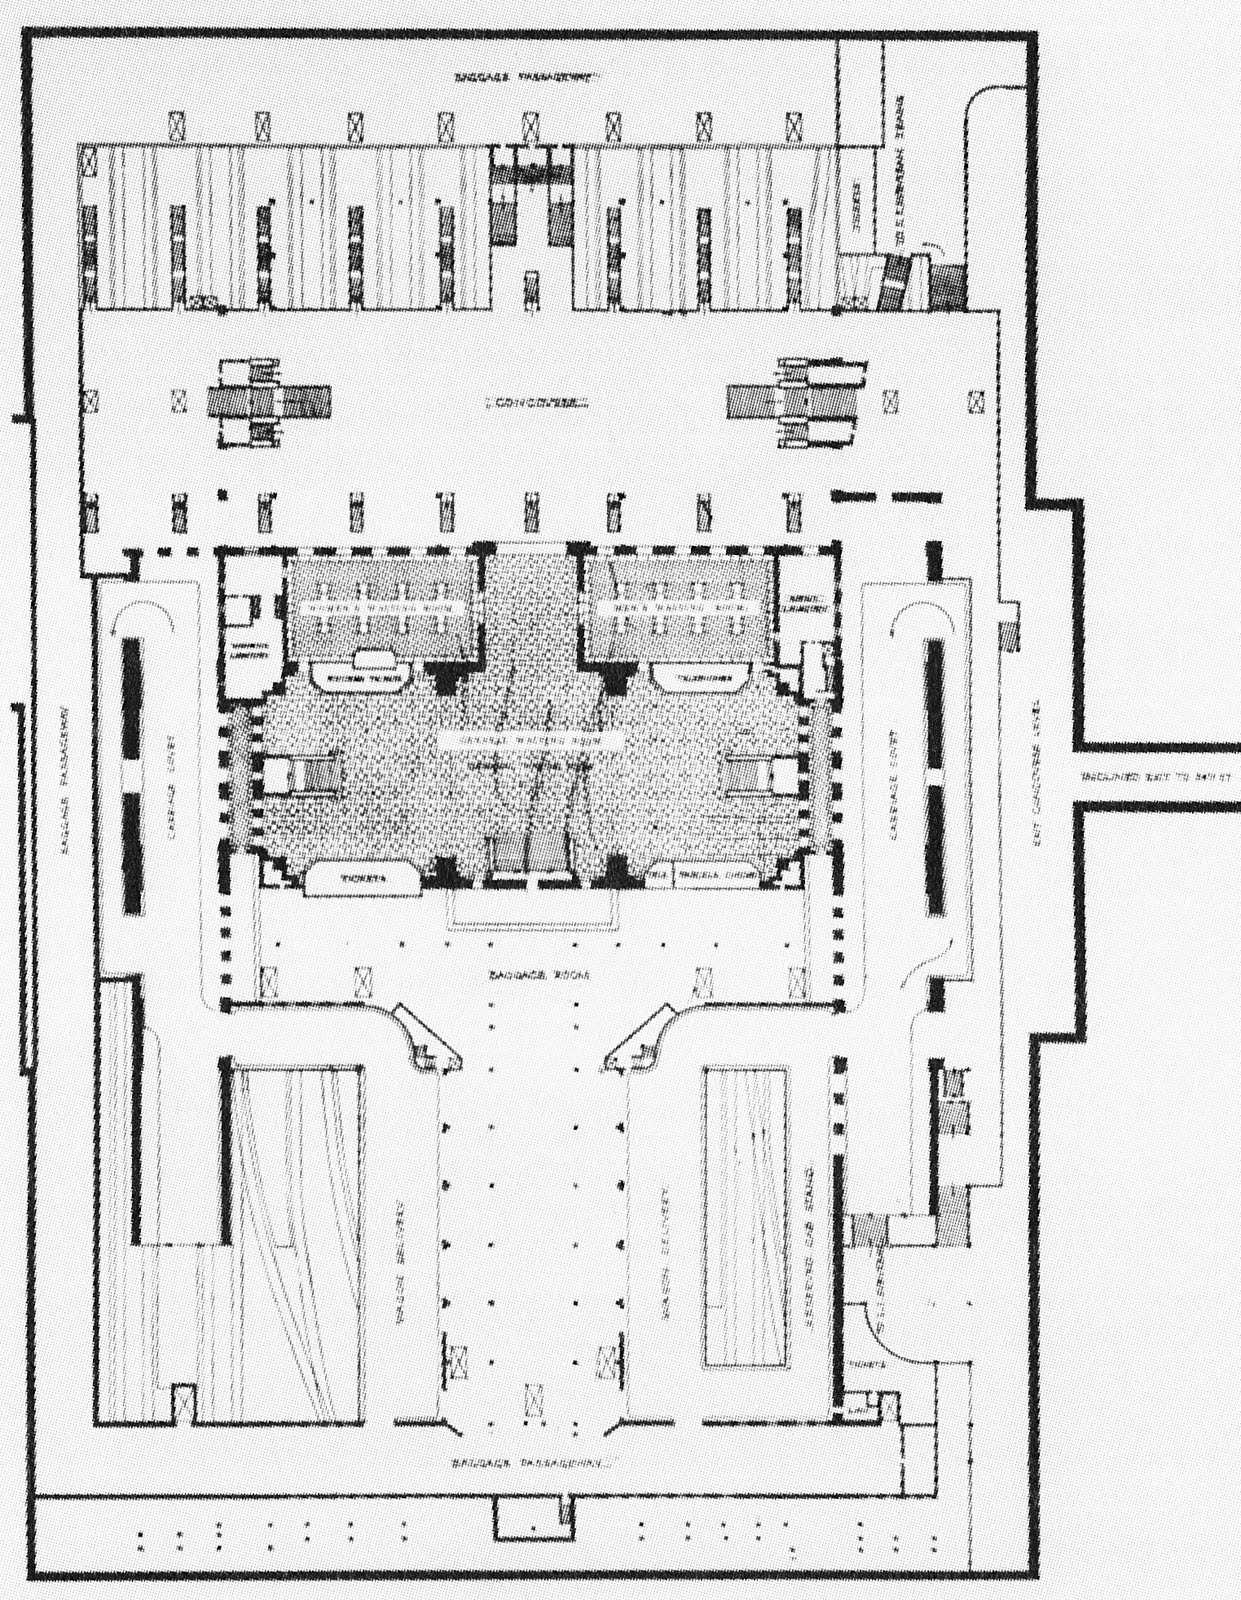 penn station pathfinder historic floorplans 1910